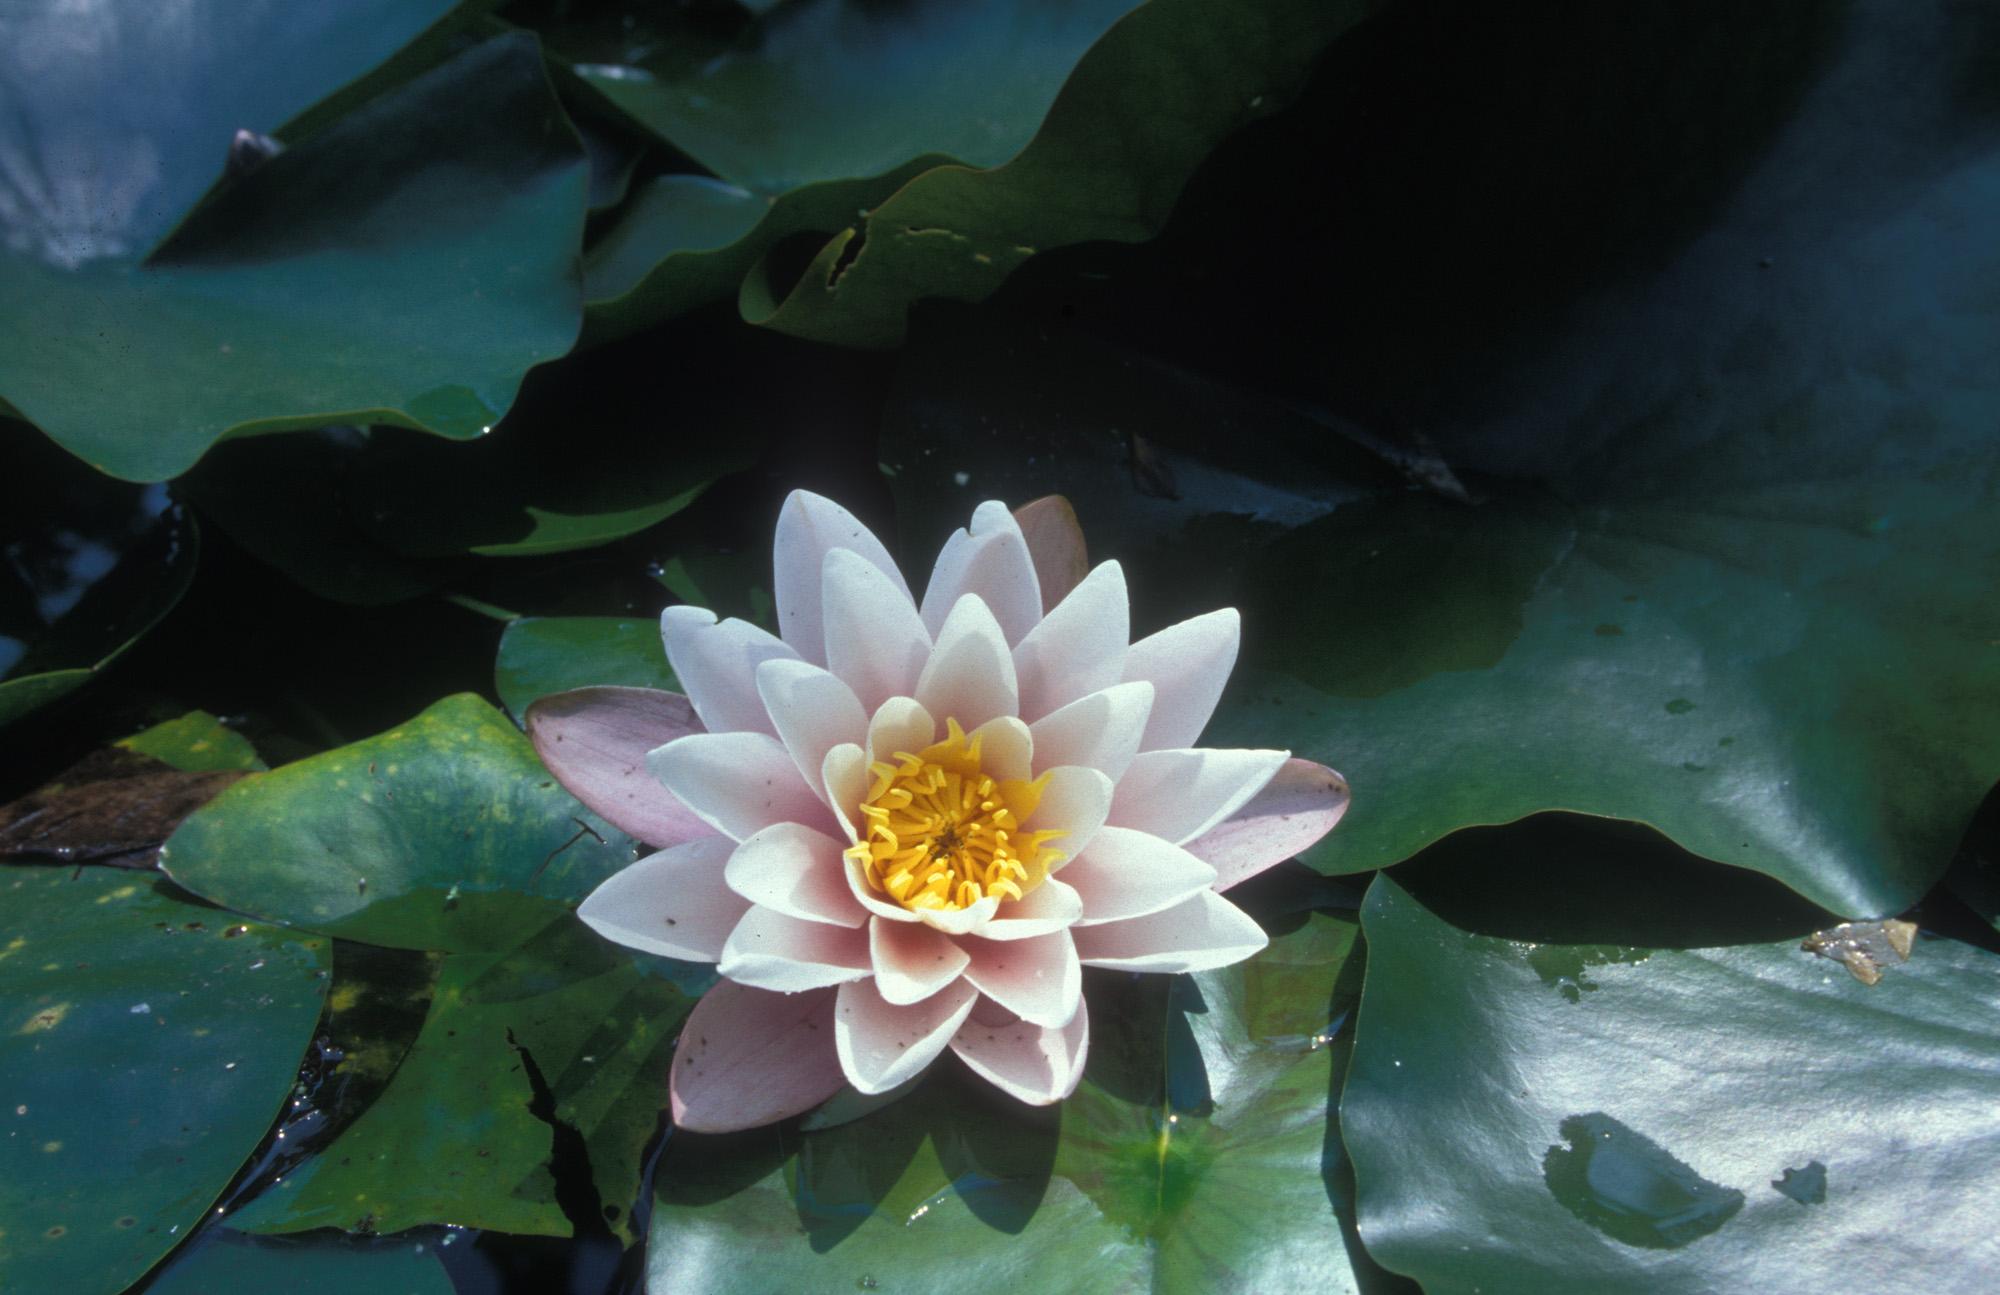 Blüte, Blüten, Pflanze, Pflanzen, Natur, Wachstum, Leben, Stempel, Blätter, Makrobereich, Makro, analog, Großformat, analoge Fotografie, Wasserrose,